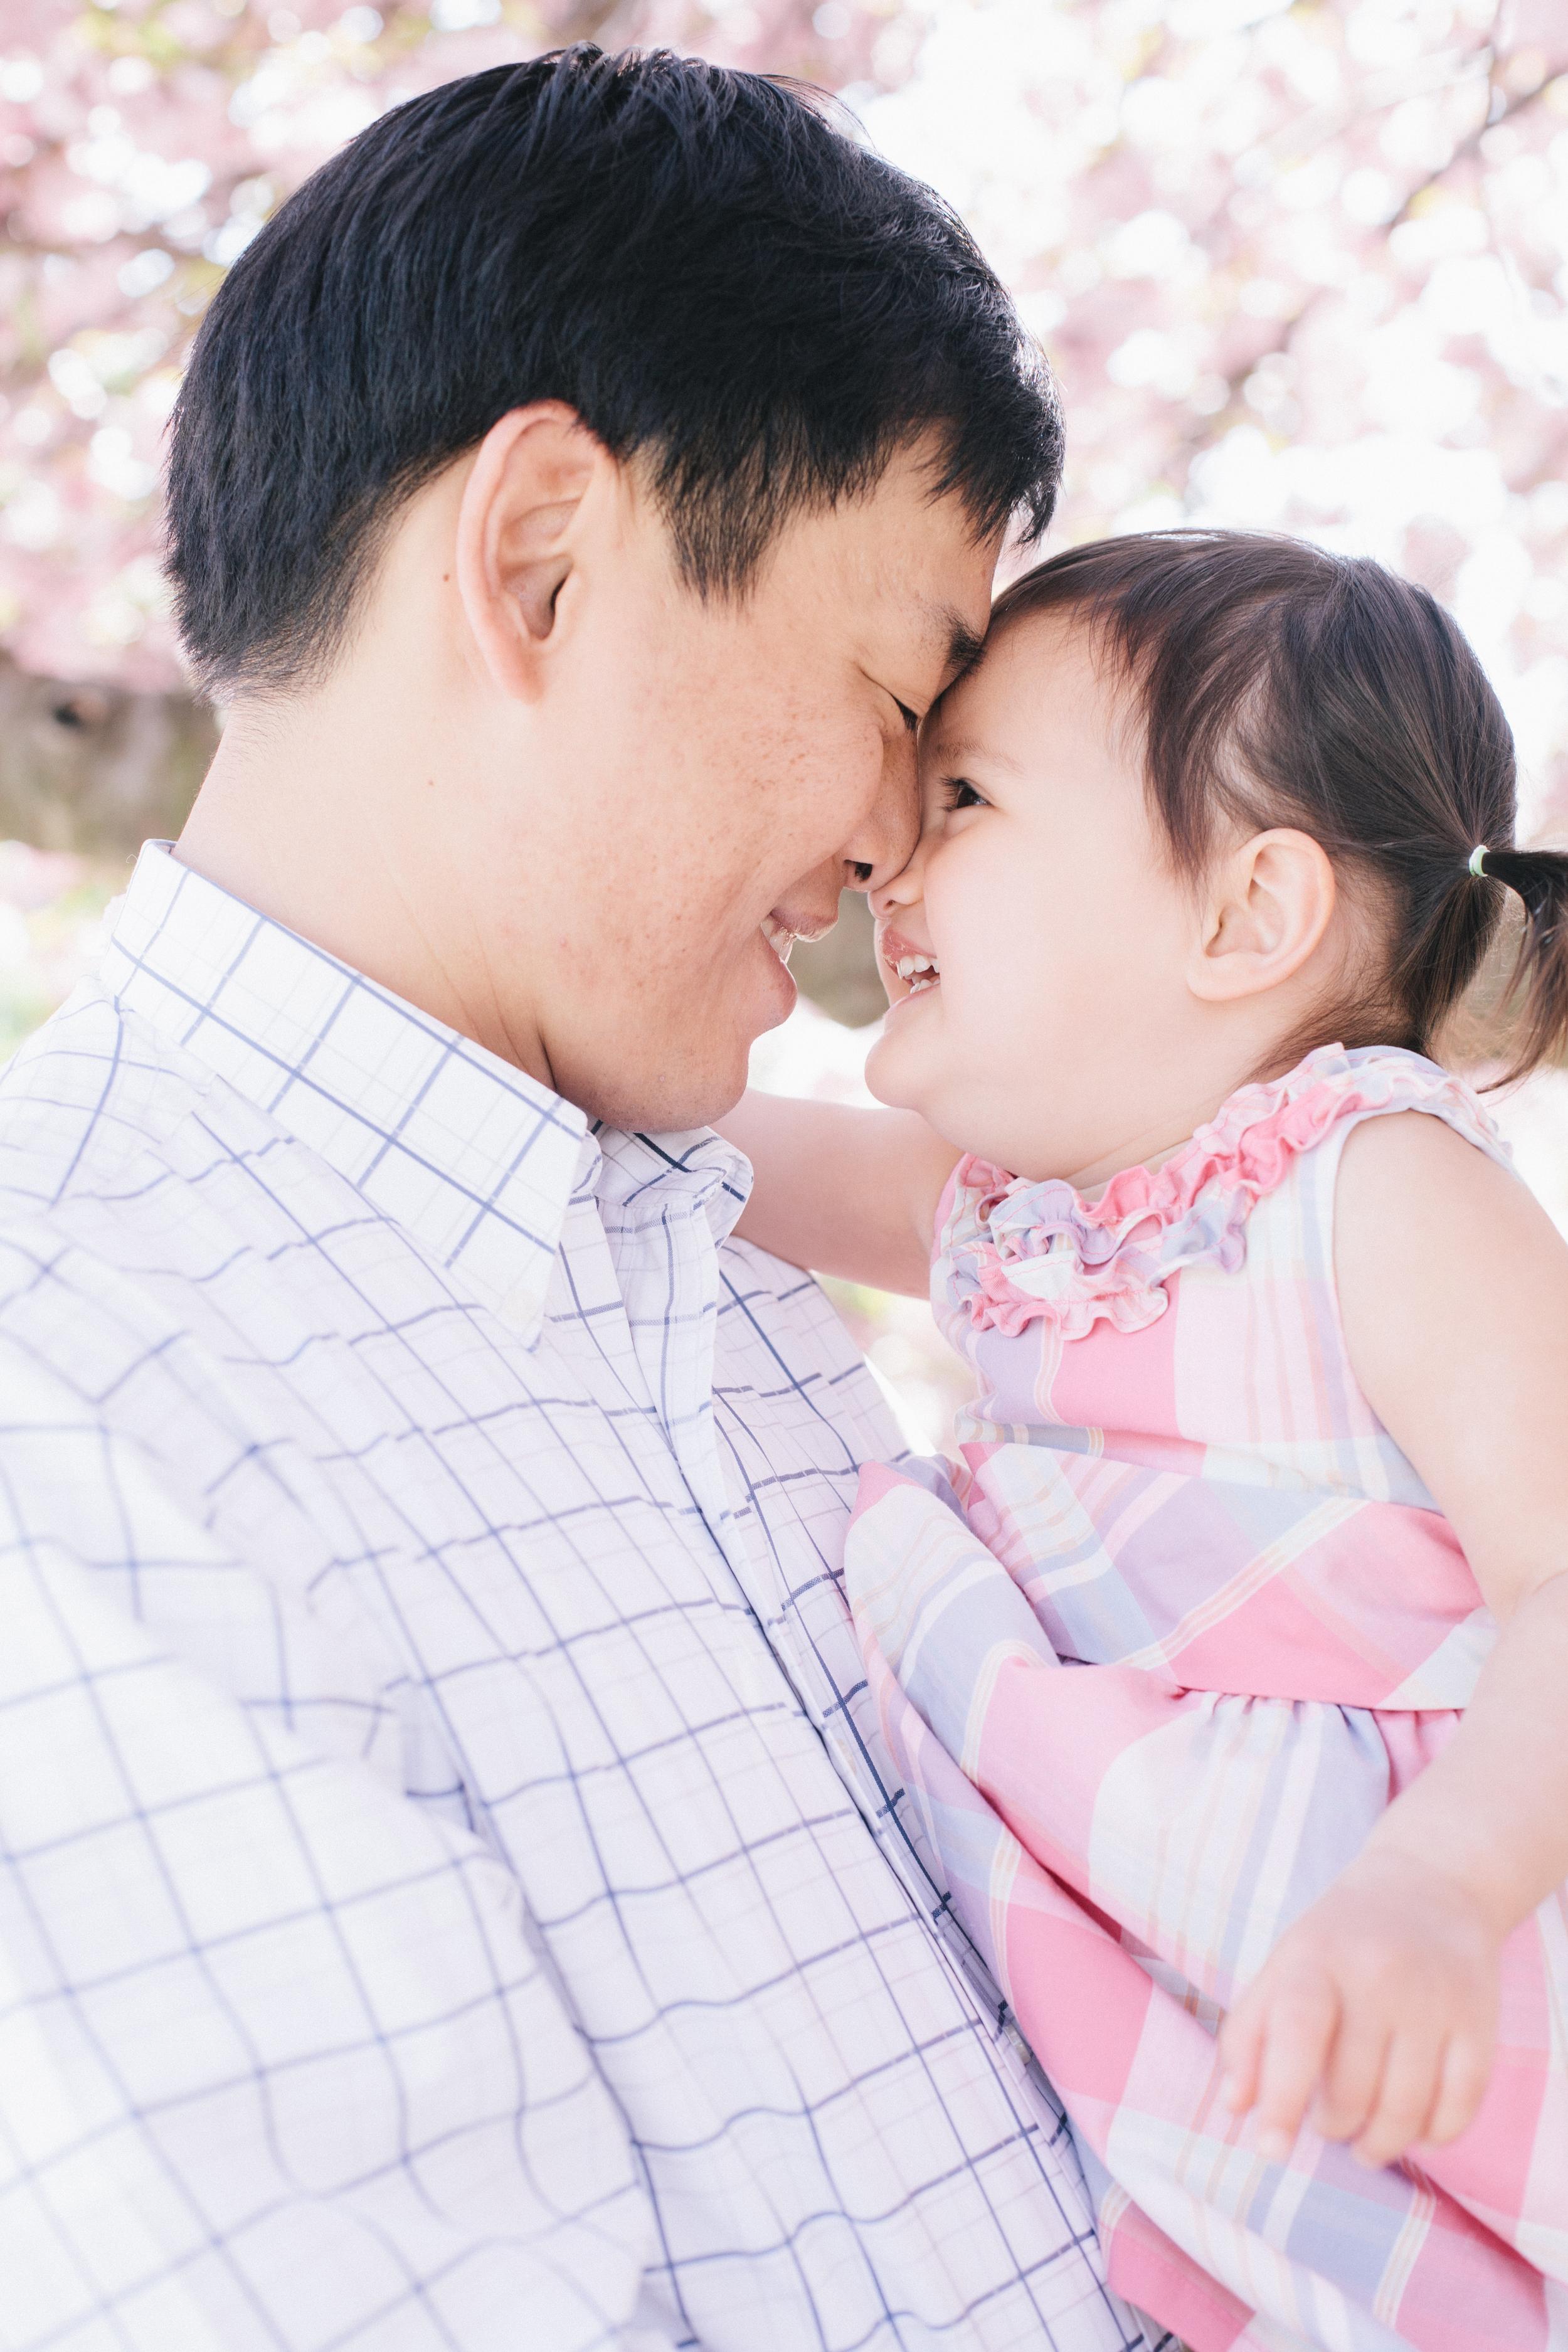 Son_Family_April_018.jpg